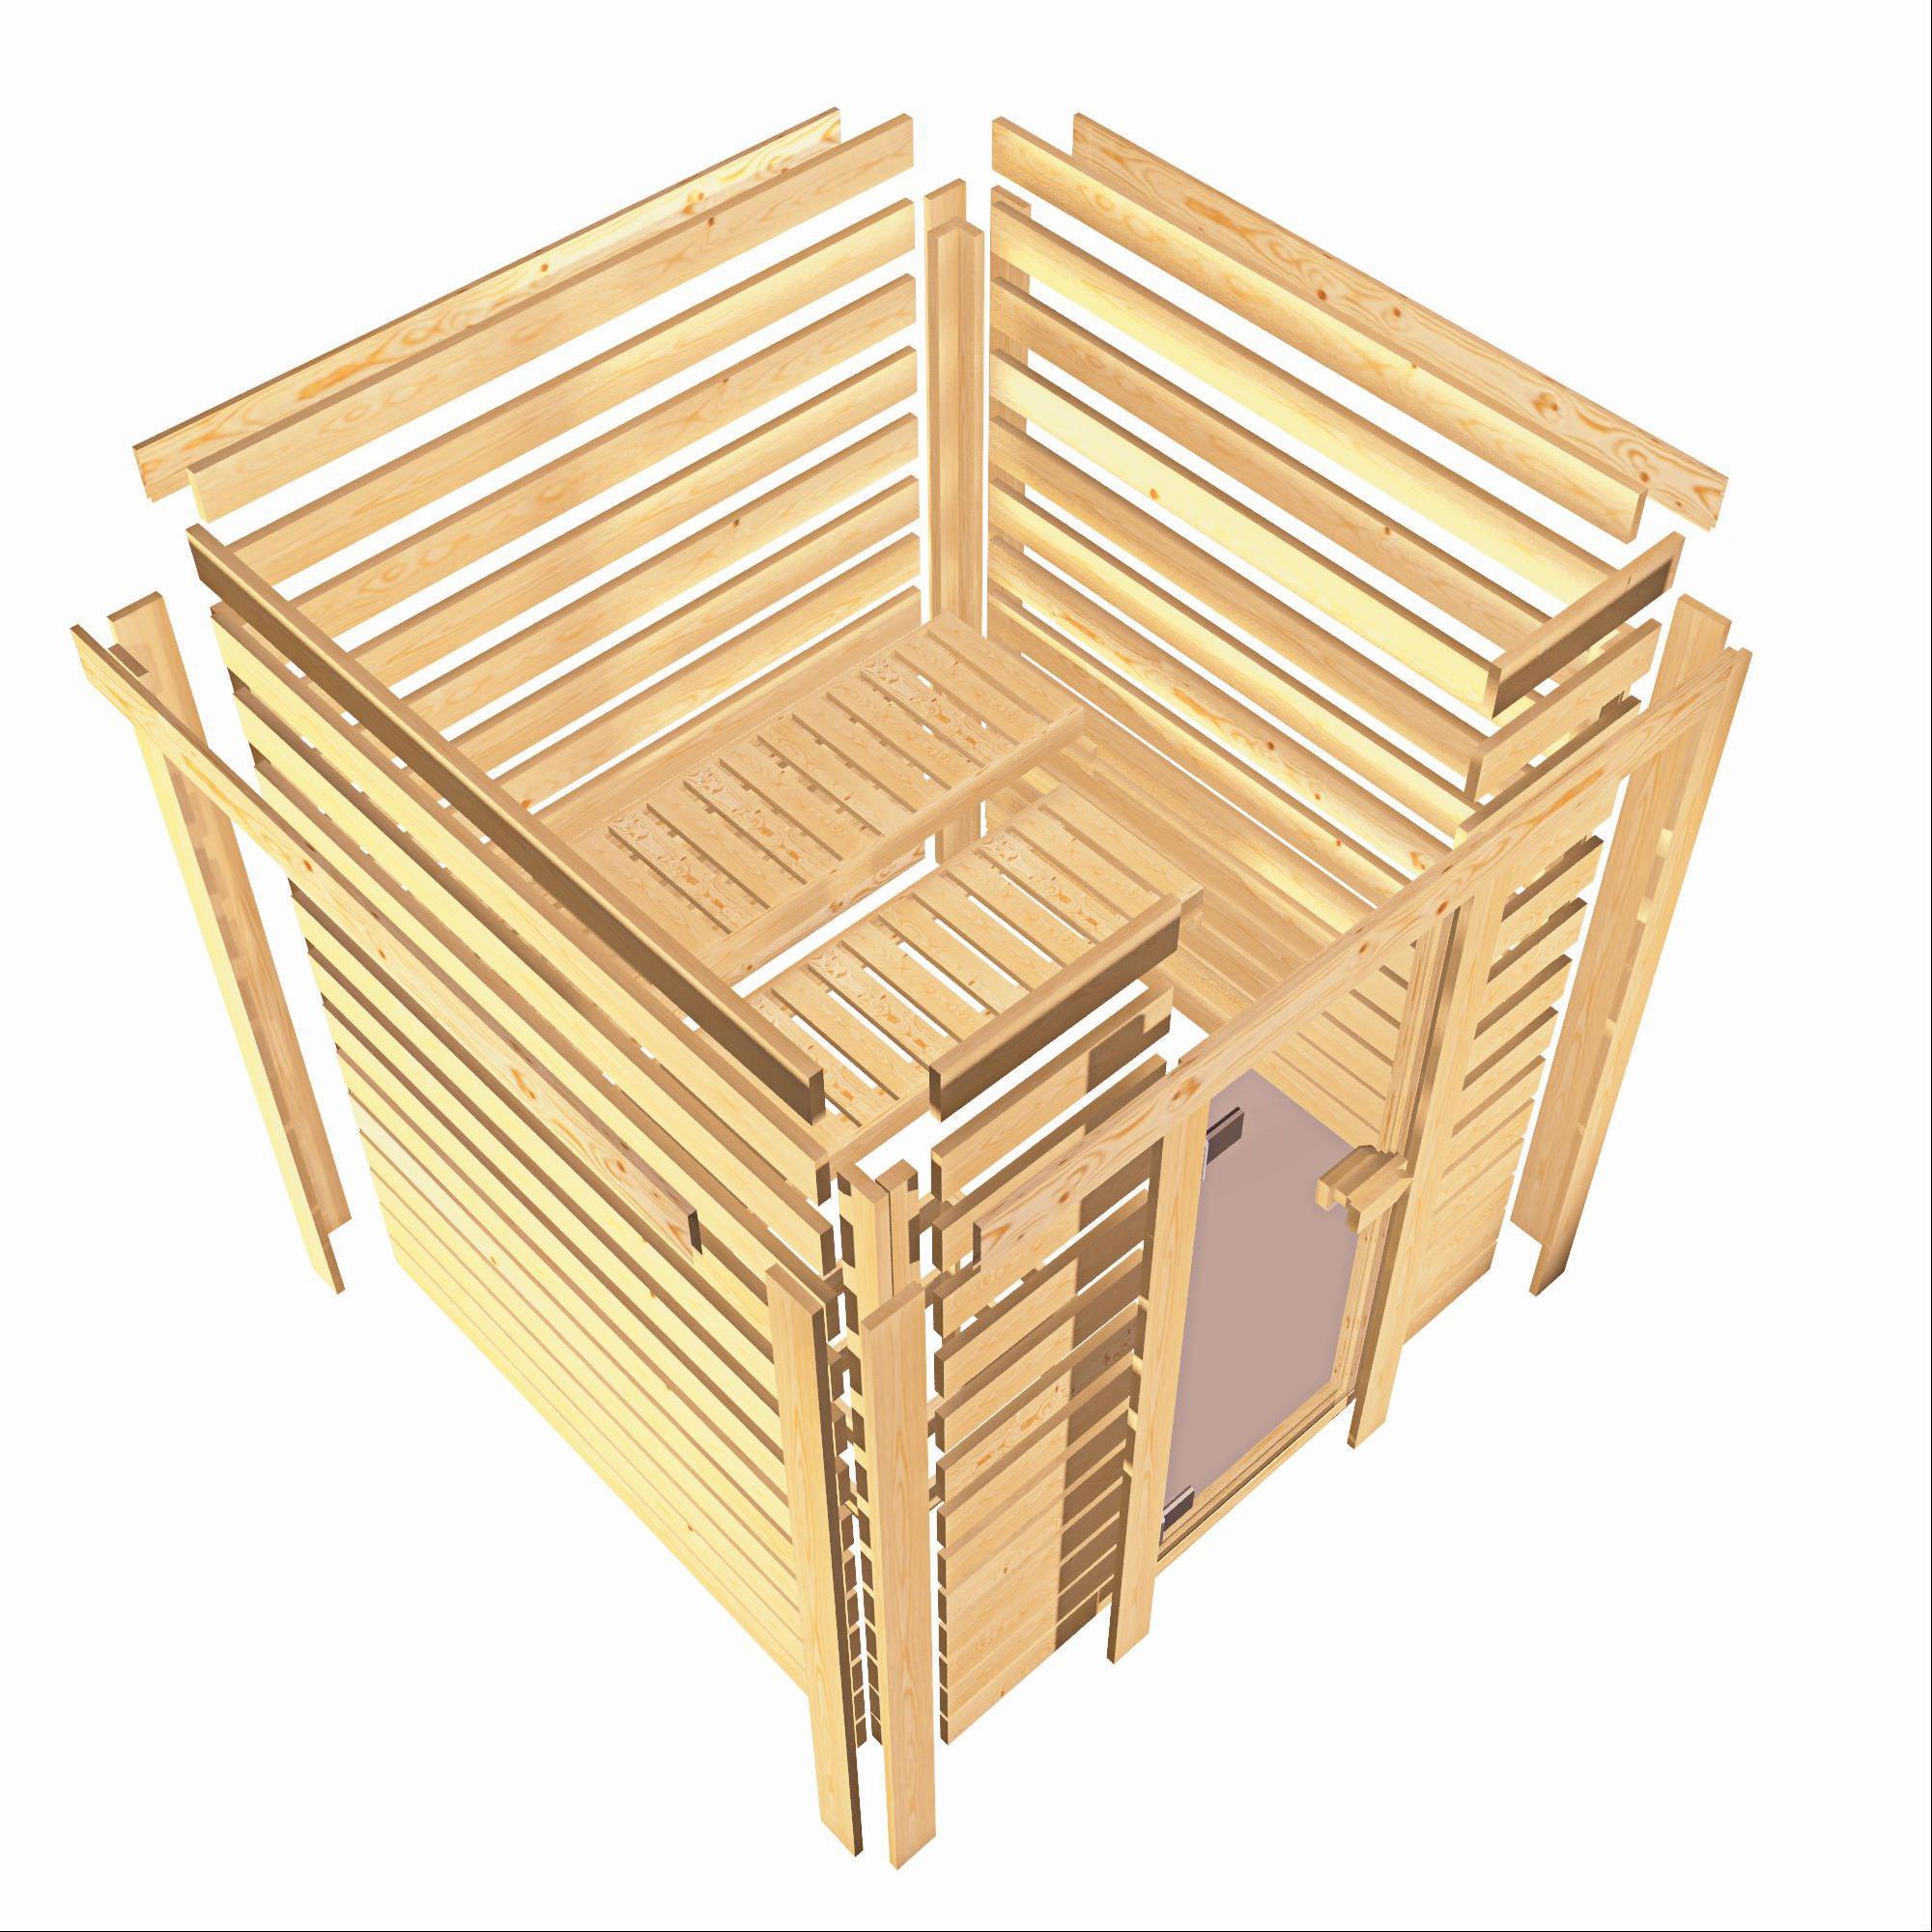 Woodfeeling Sauna Franka 38mm Bio Saunaofen 9kW ext. Kranz Holztür Bild 4